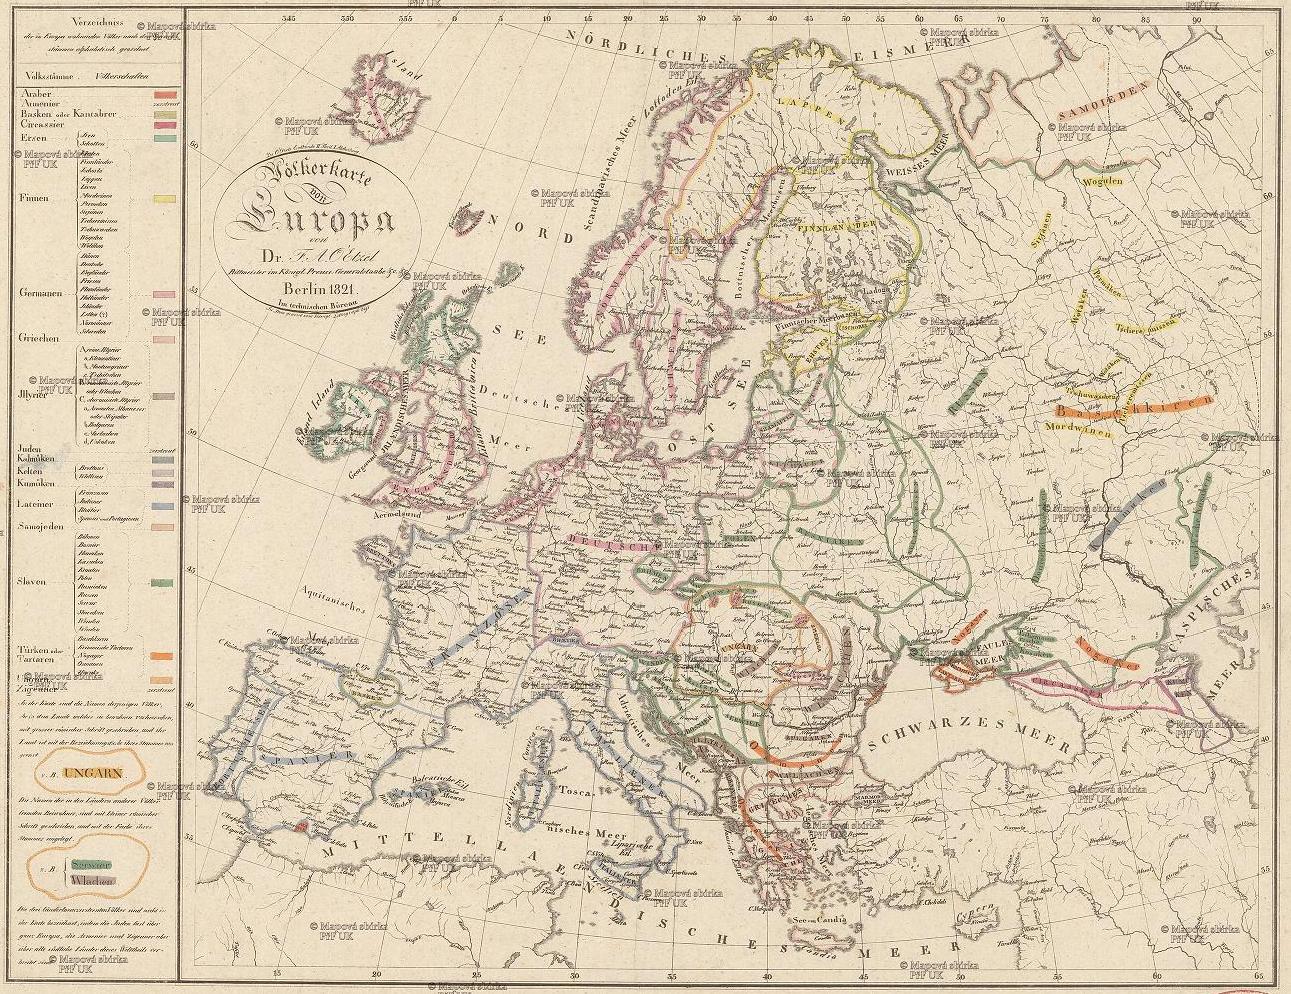 File:Völkerkarte von Europa (1821).png